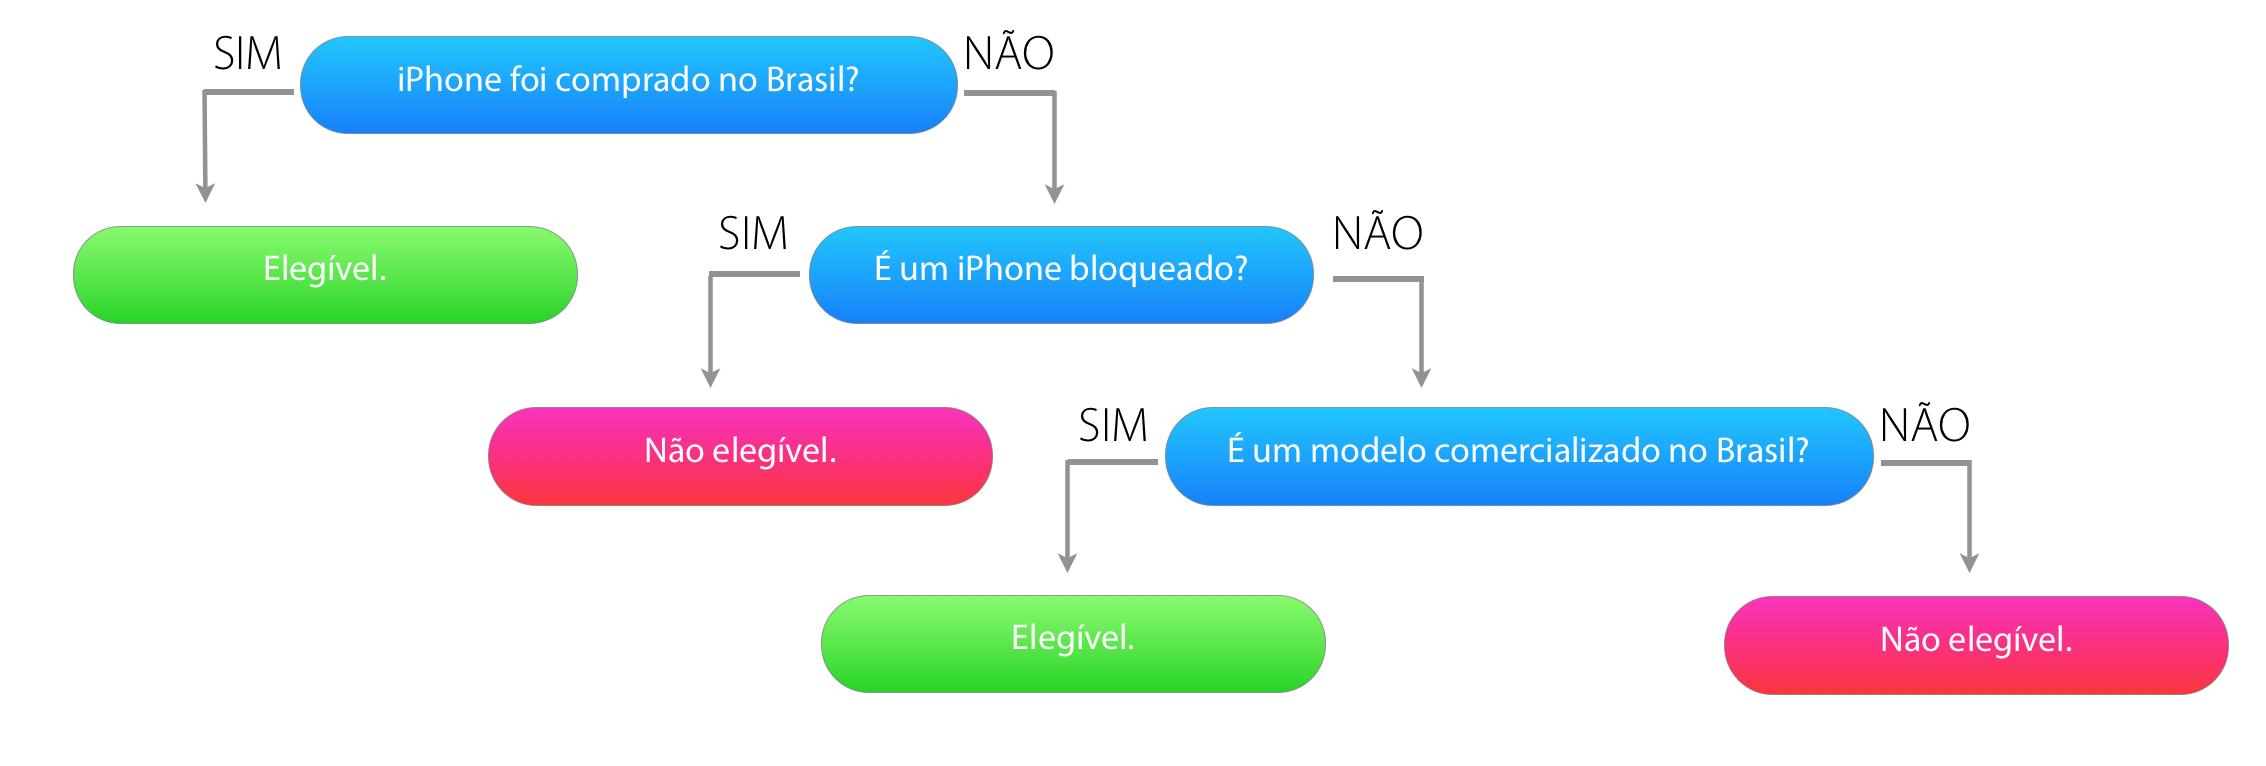 Fluxograma de elegibilidade de garantia de iPhones